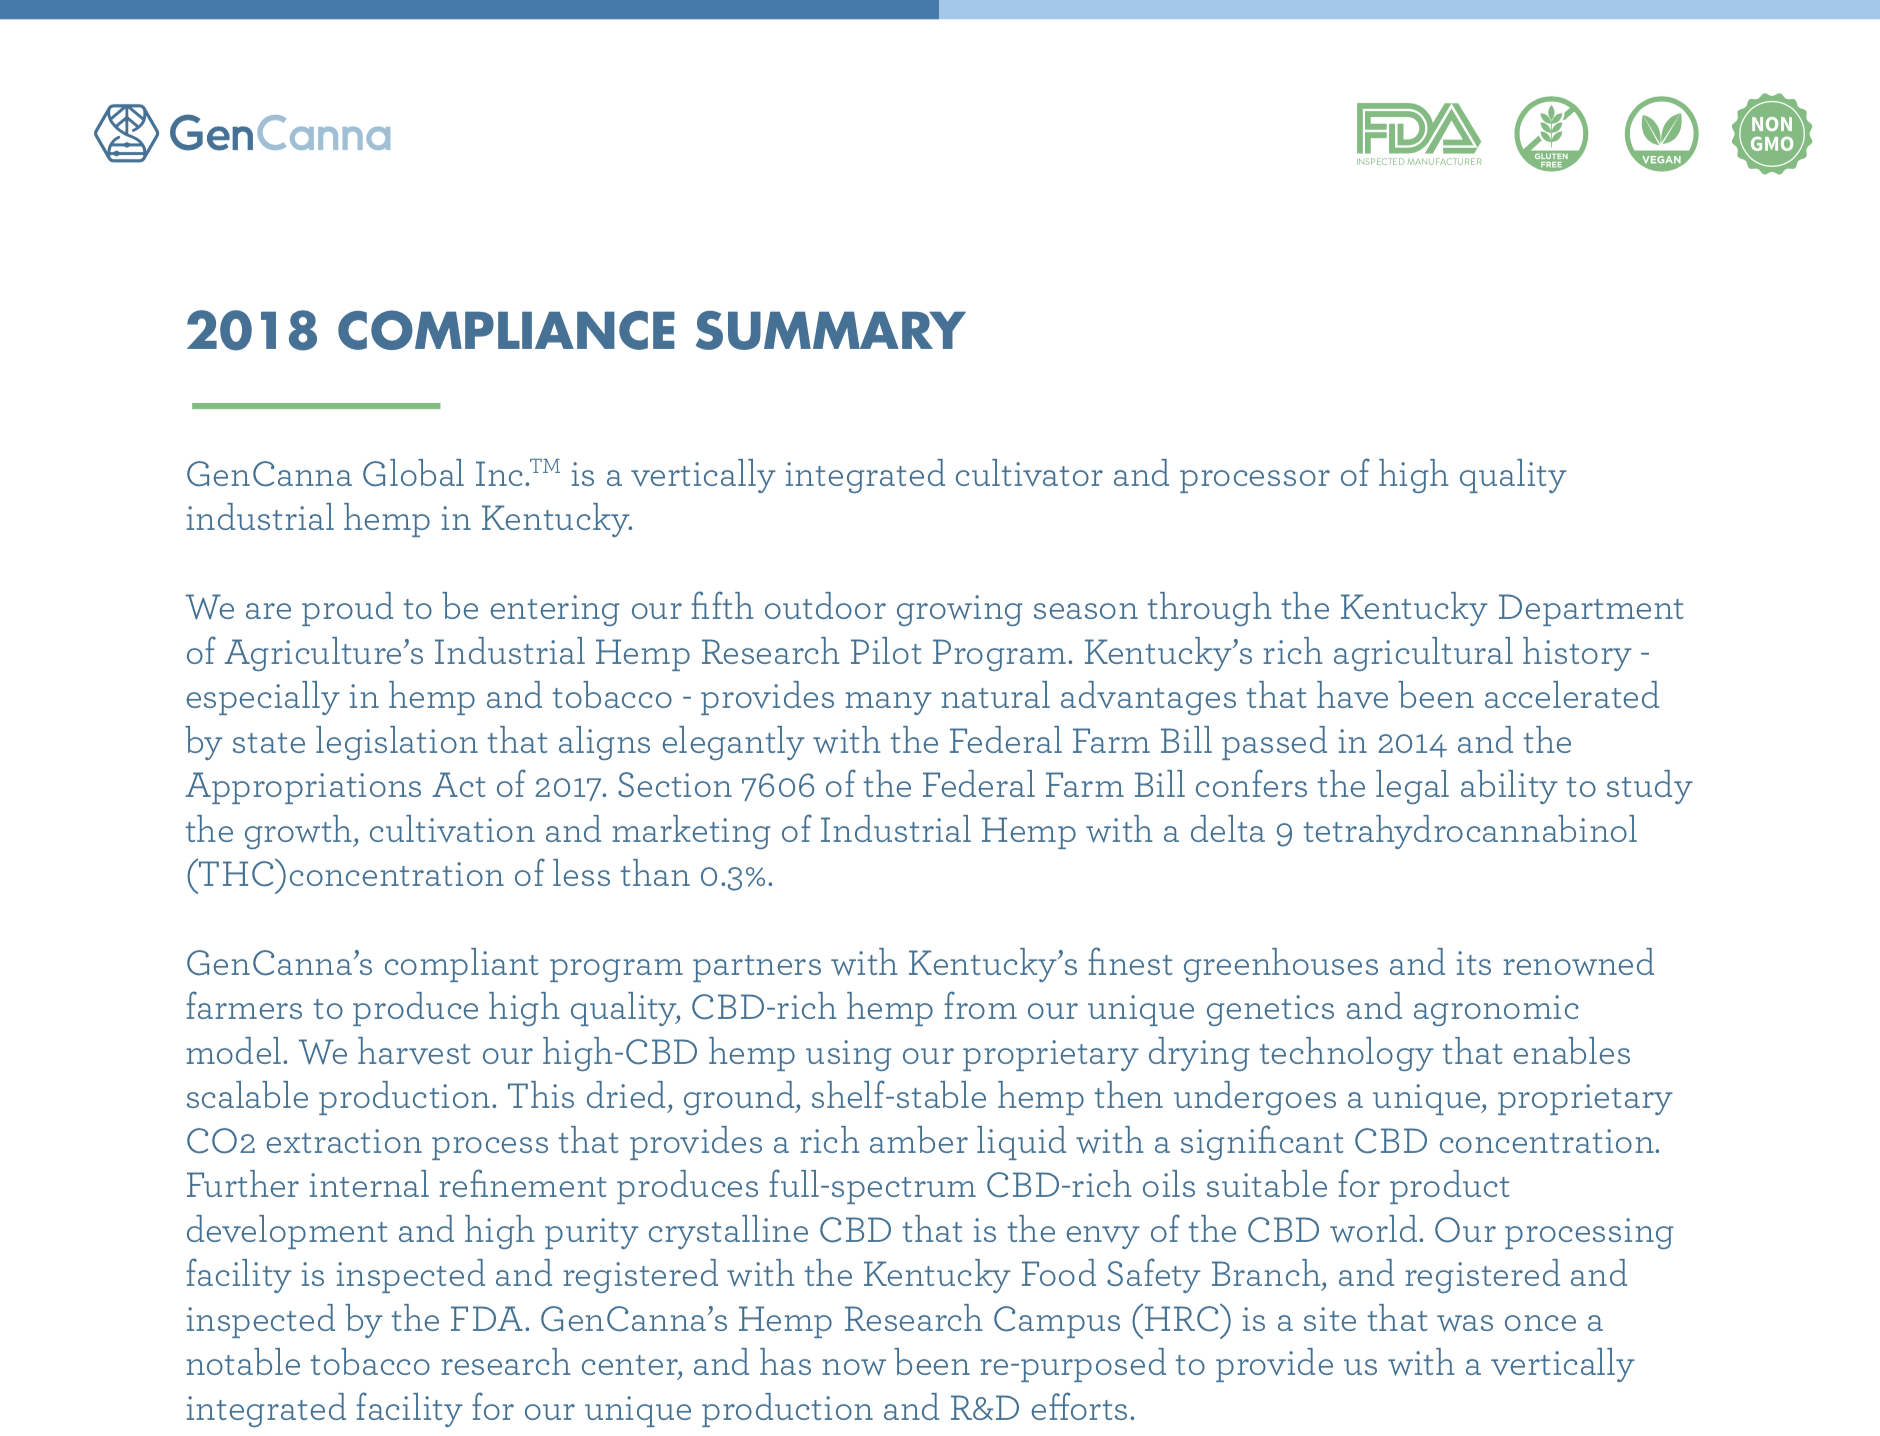 Short compliance document -